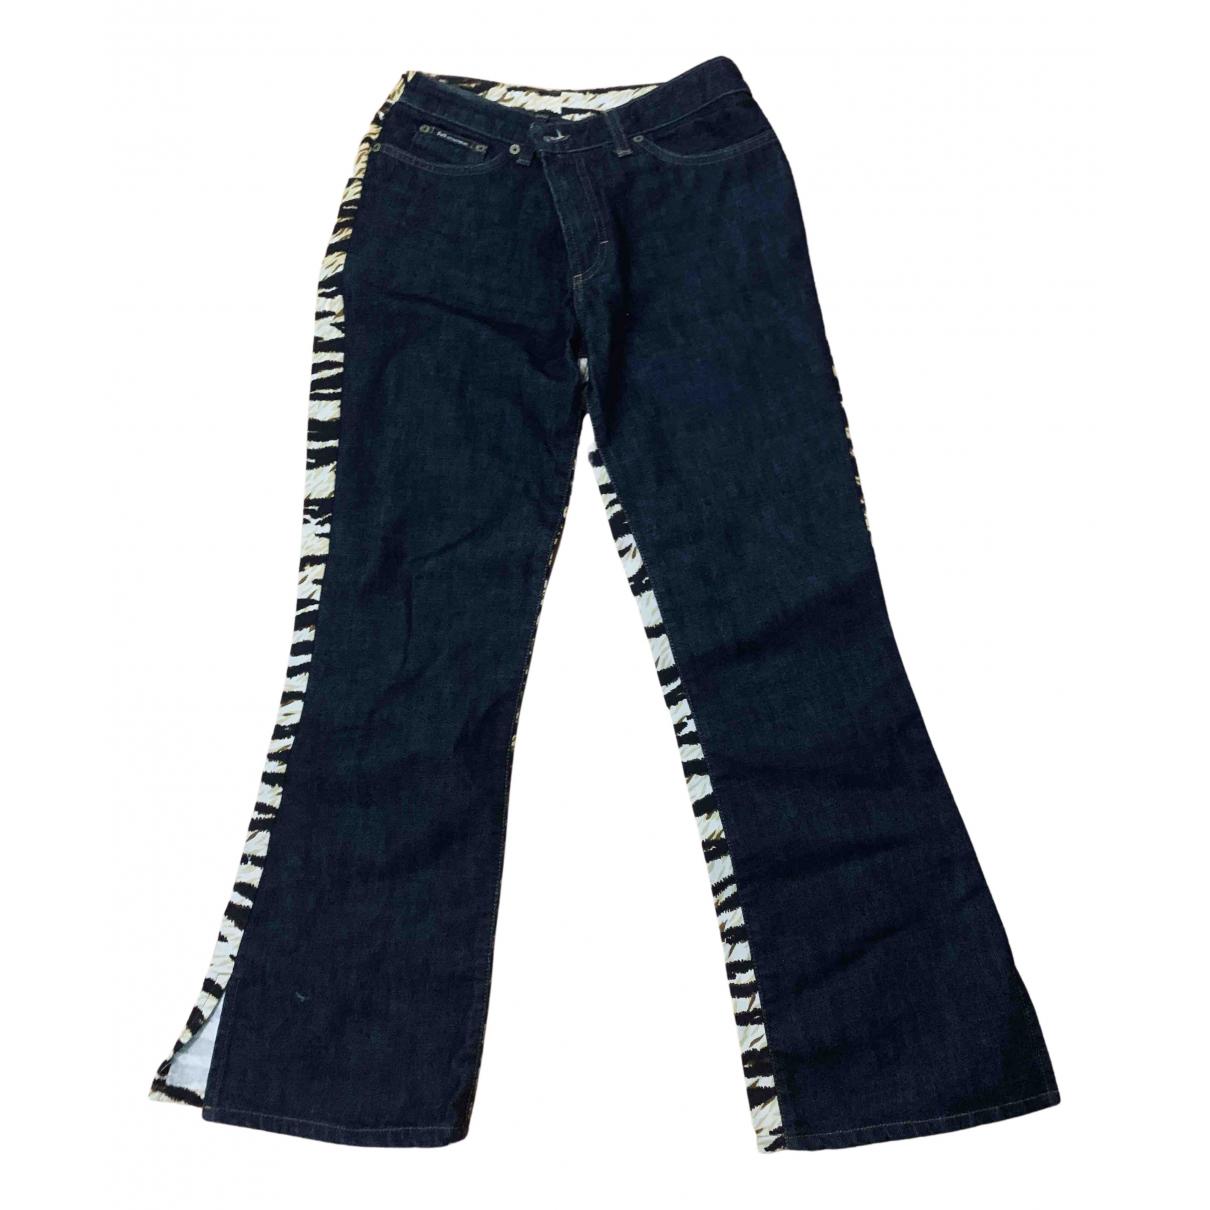 D&g N Blue Denim - Jeans Jeans for Women 30 US